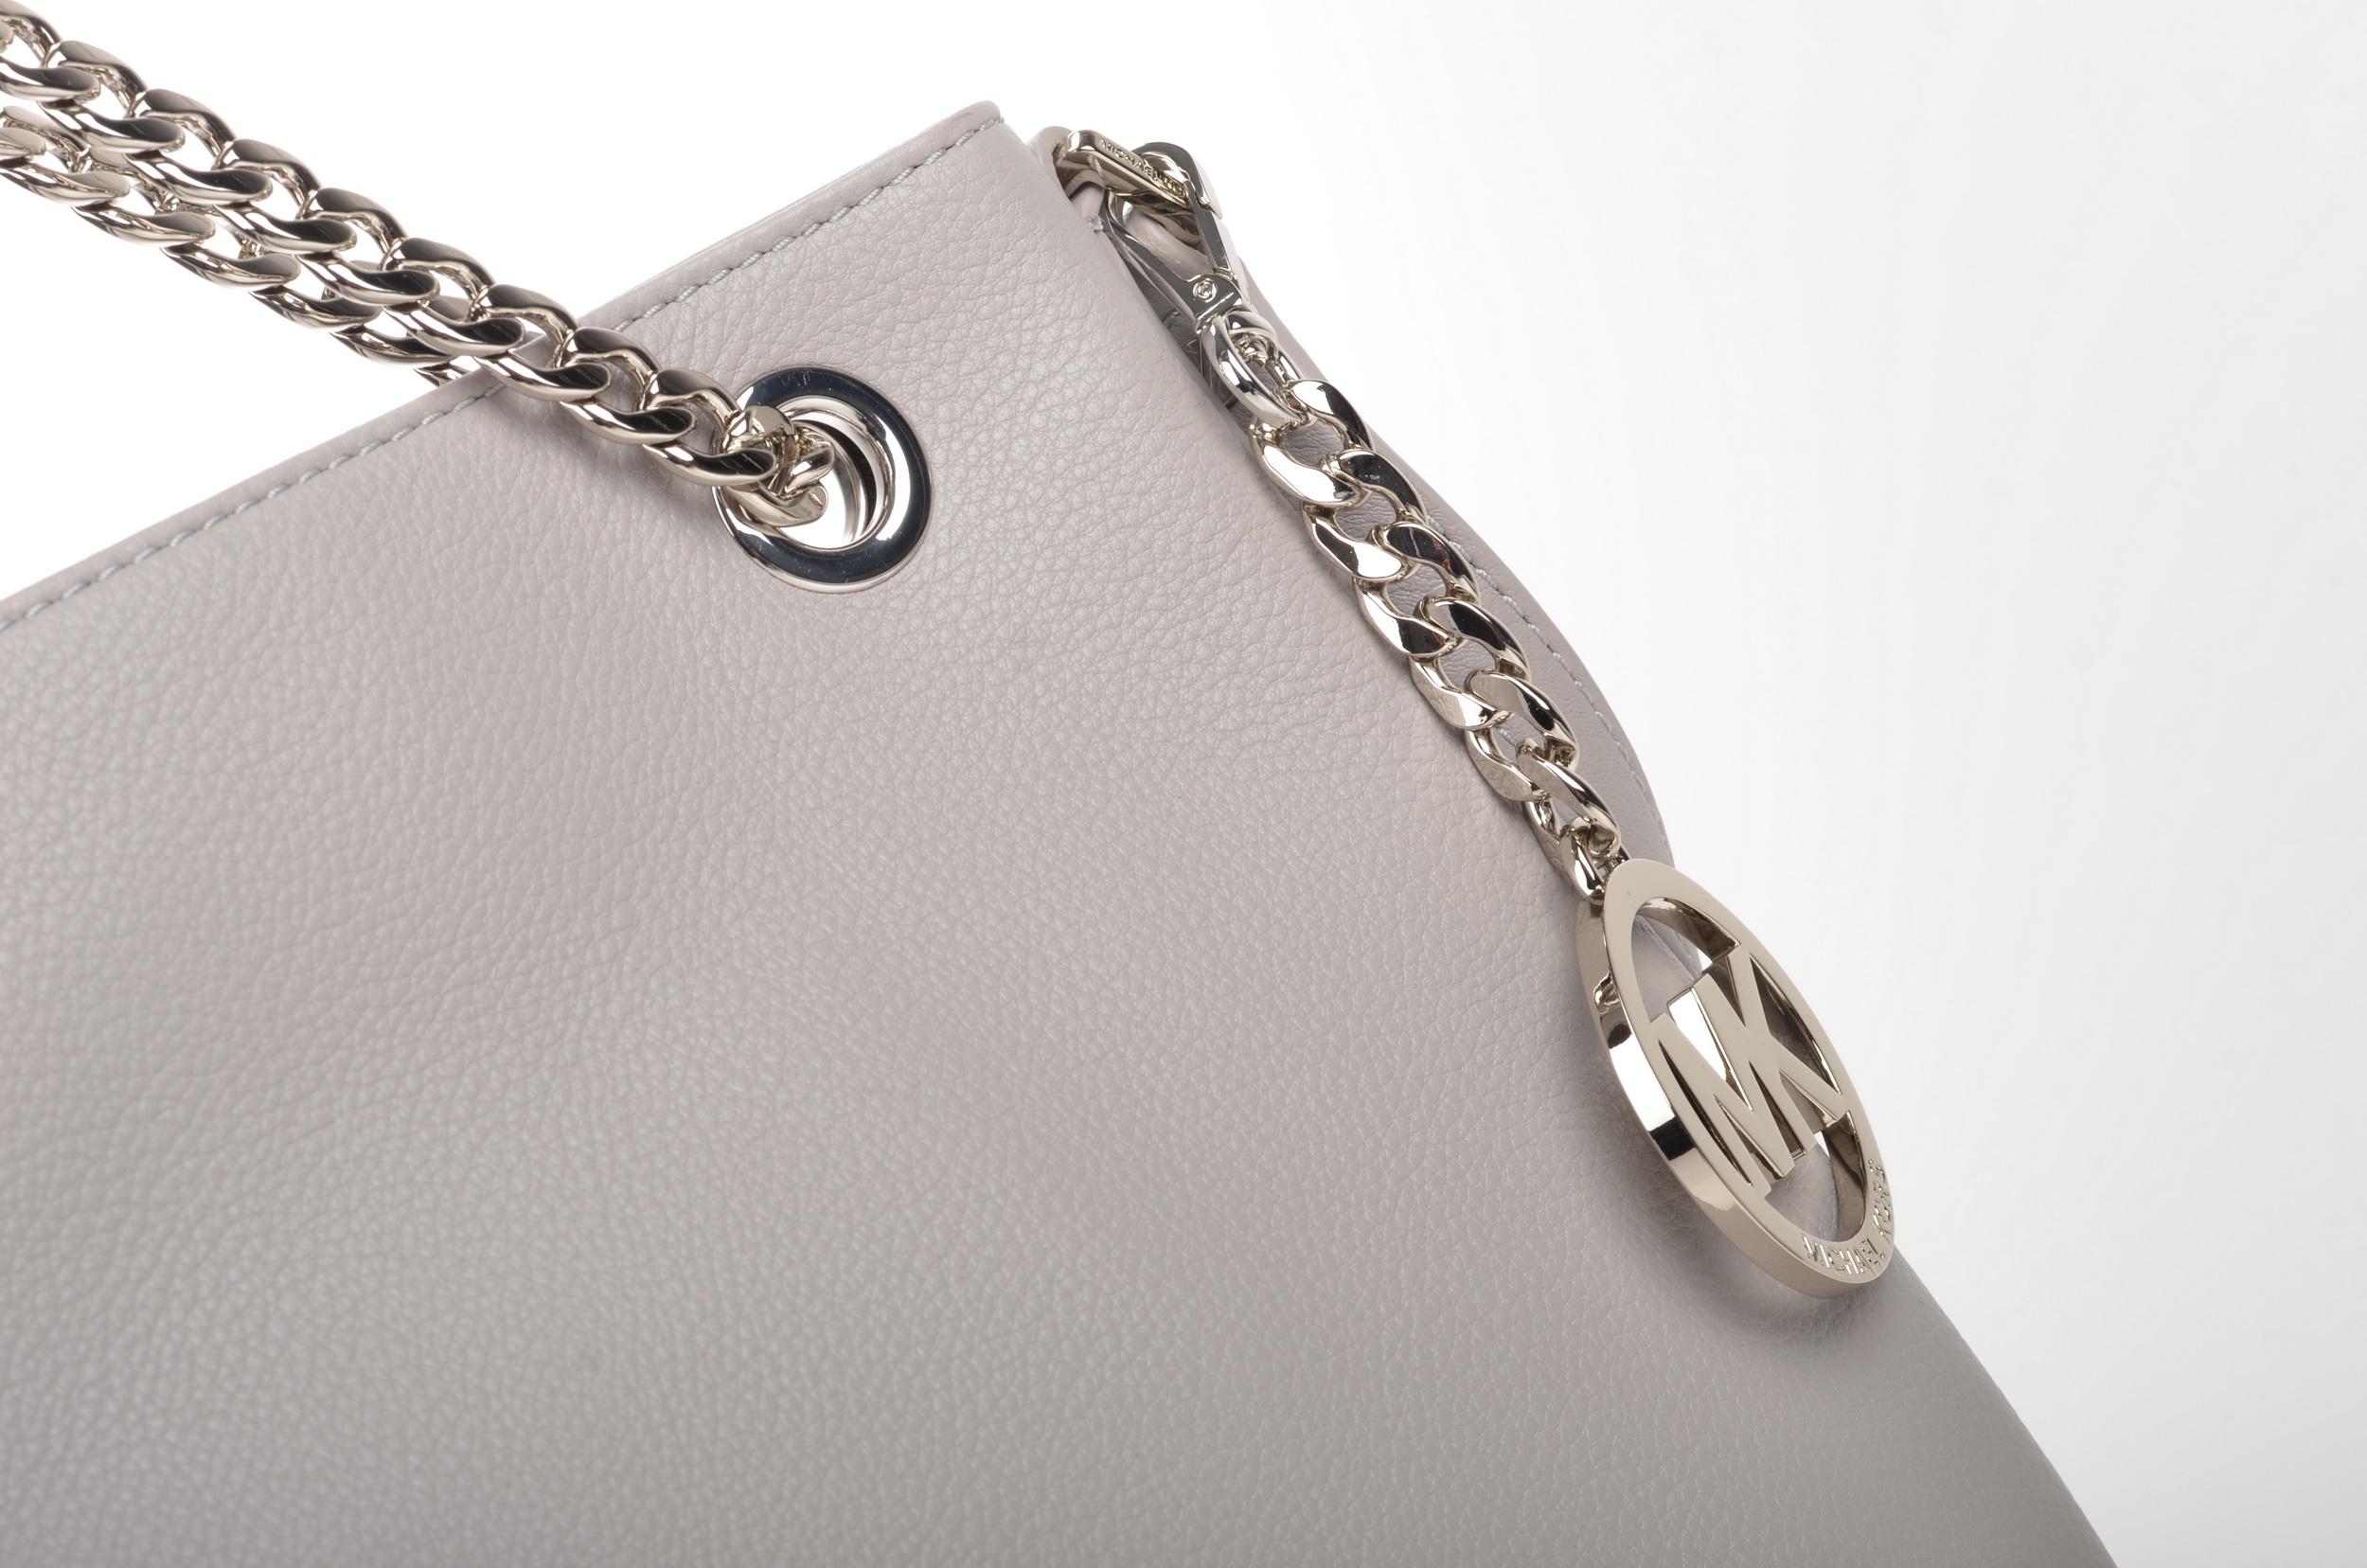 File:Michael Kors Jet Set Chain Item LG Chain Shldr Tote